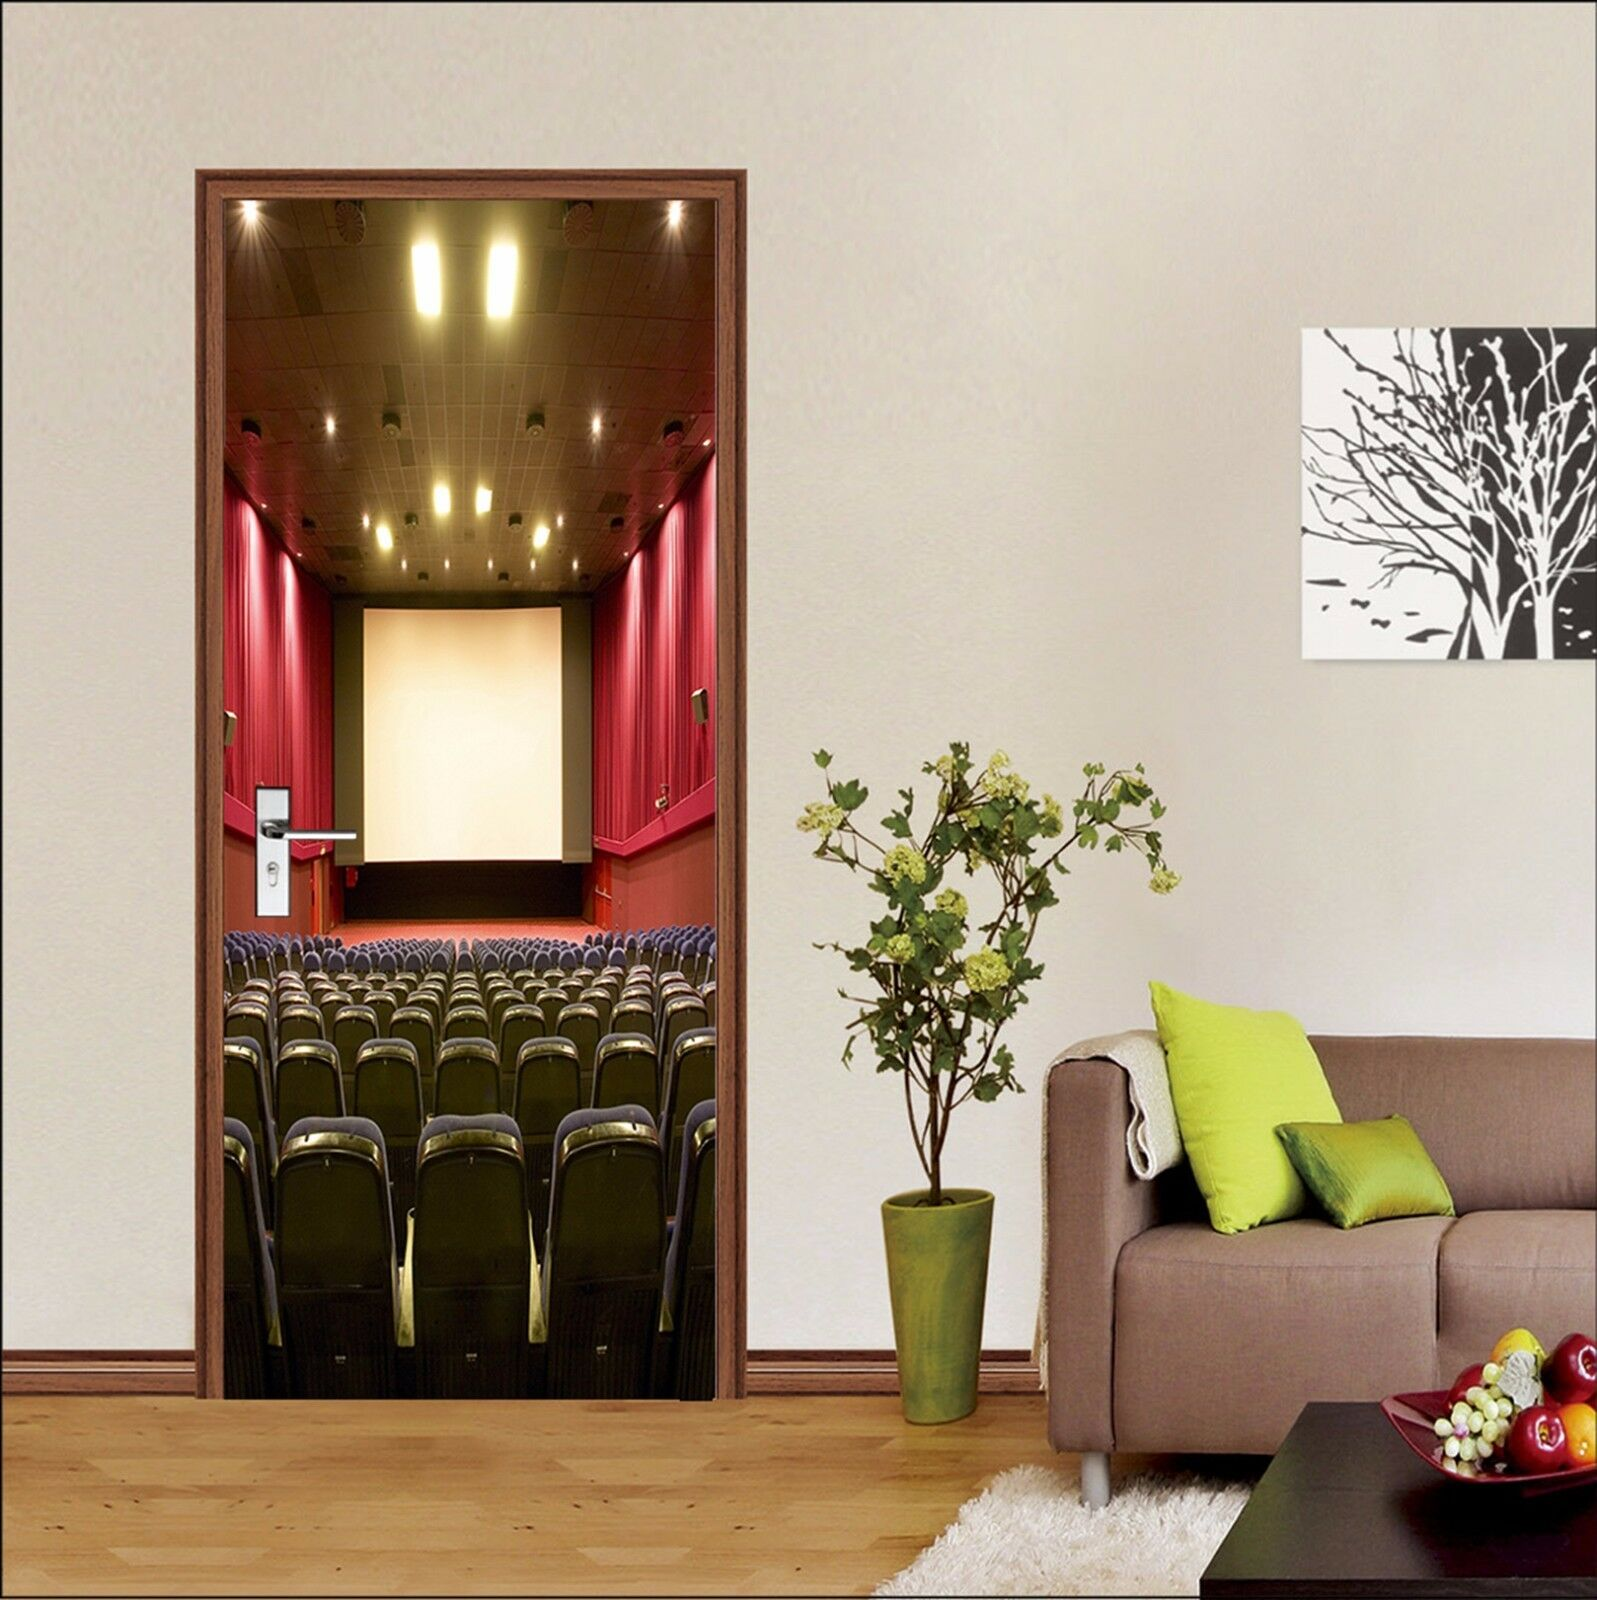 3D Bühne 763 Tür Wandmalerei Wandaufkleber Aufkleber AJ WALLPAPER DE Kyra | München  | Perfekt In Verarbeitung  |  Neuer Markt